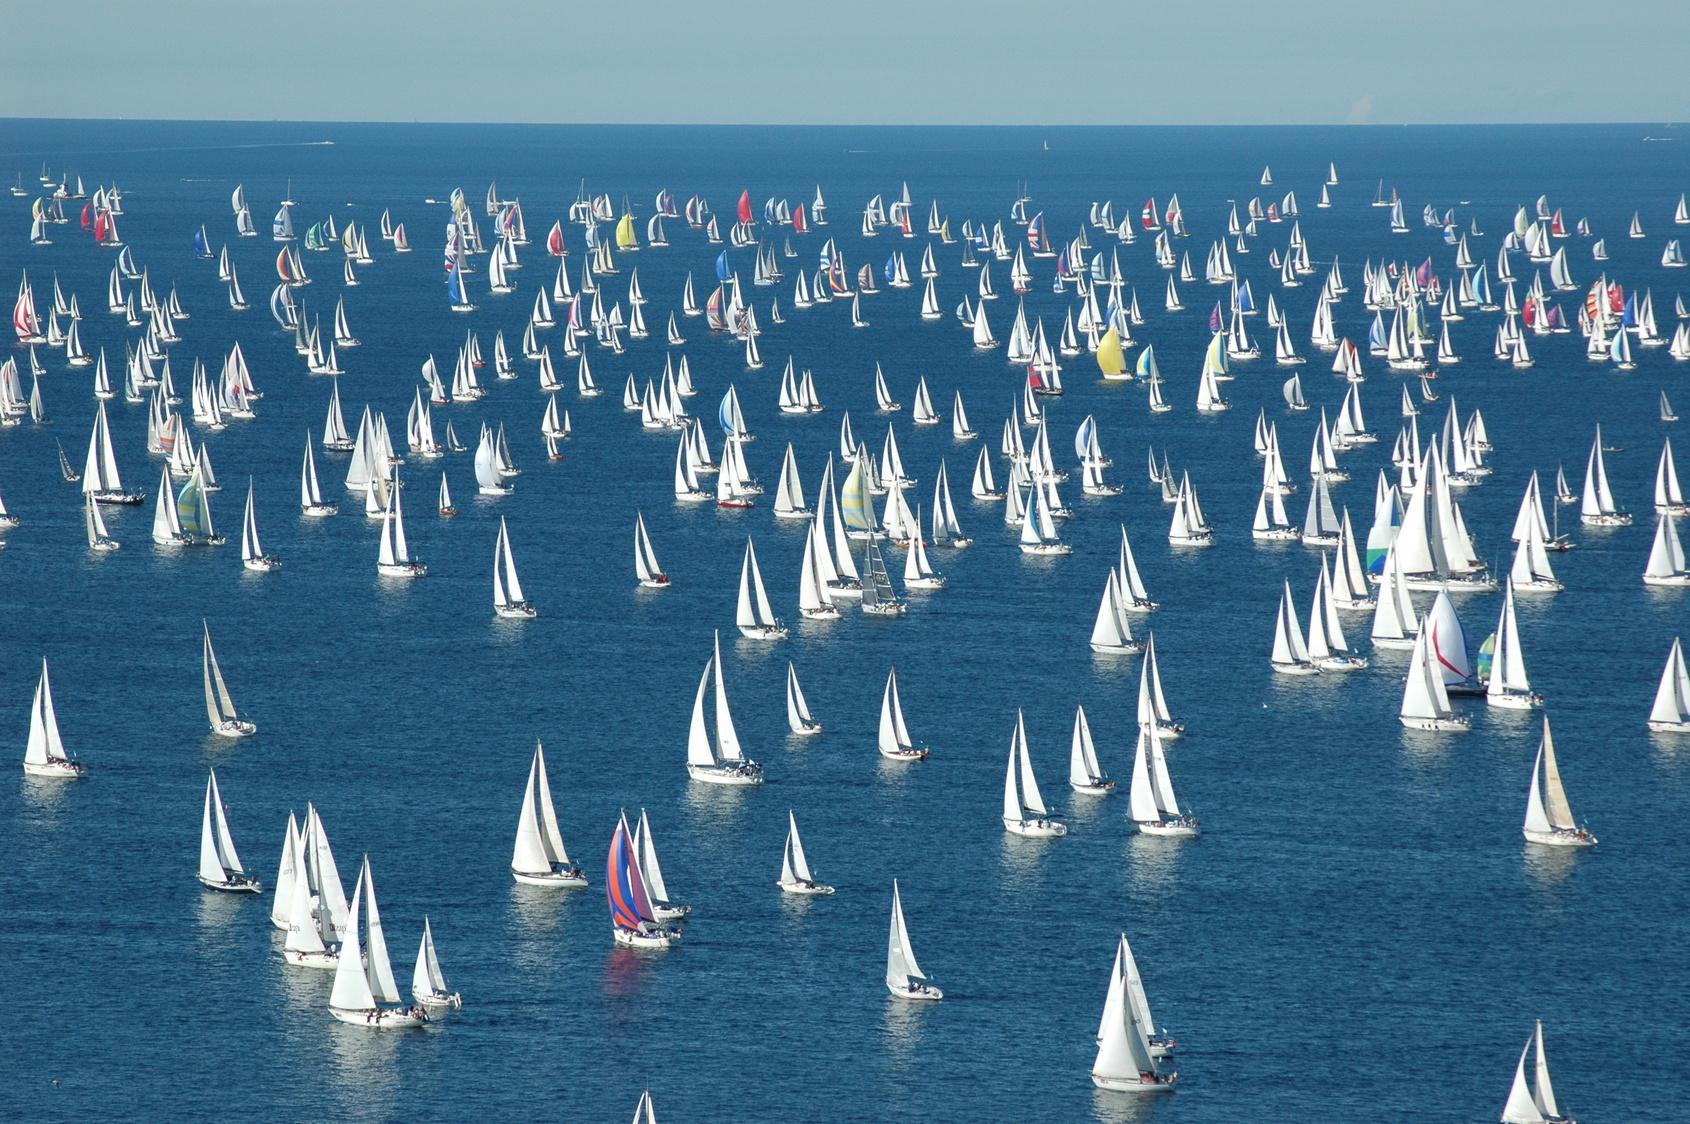 Regattas, sailing race, sailing yachts